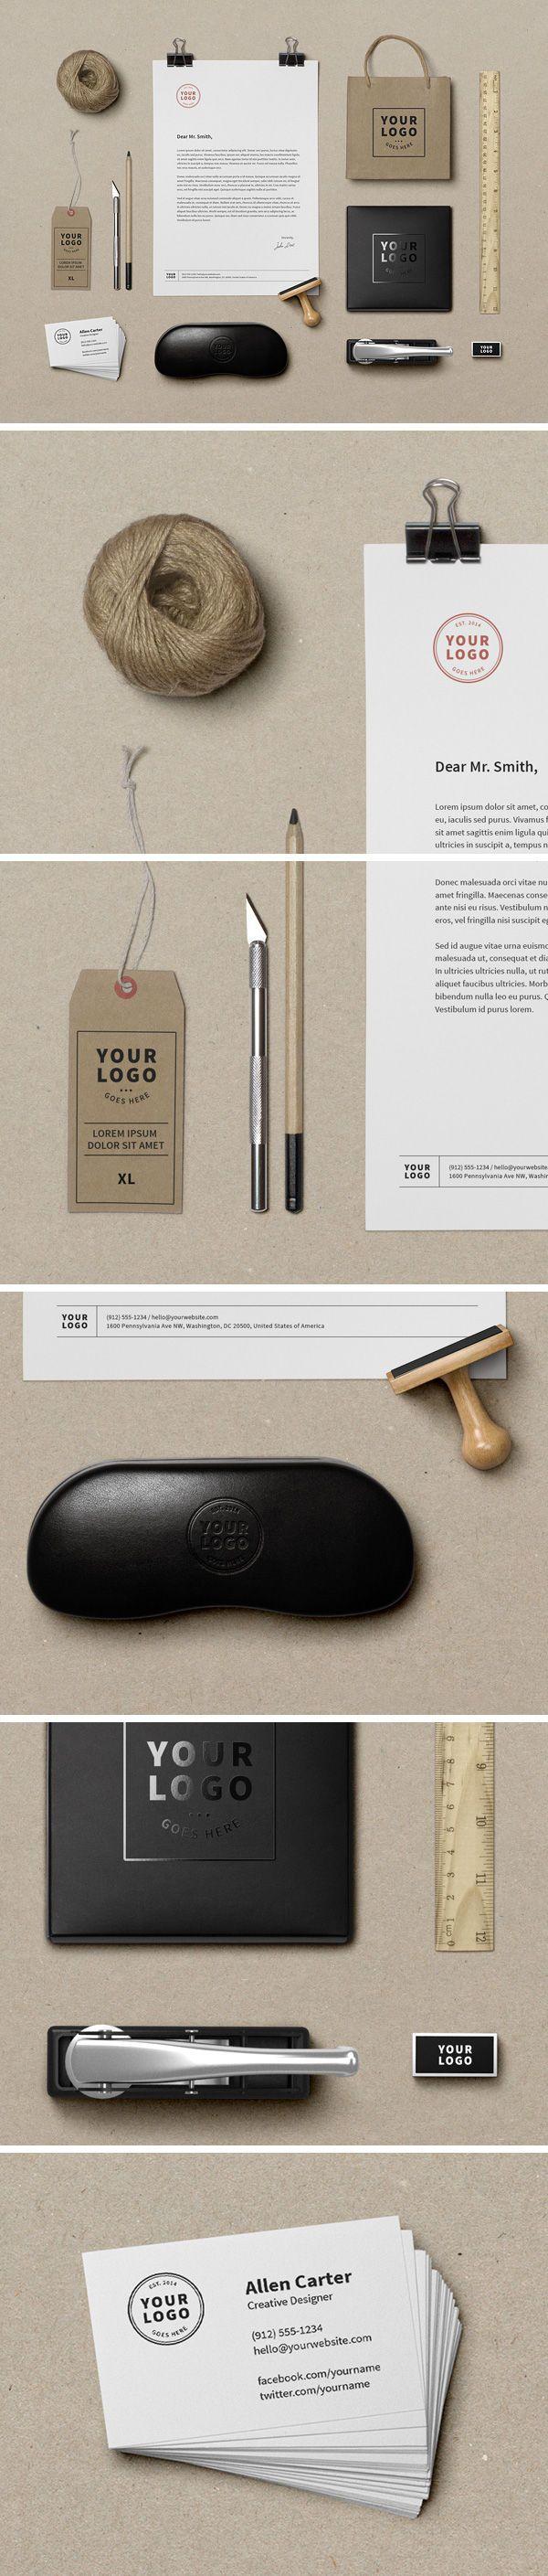 Free Branding Mockup | Abduzeedo Design Inspiration